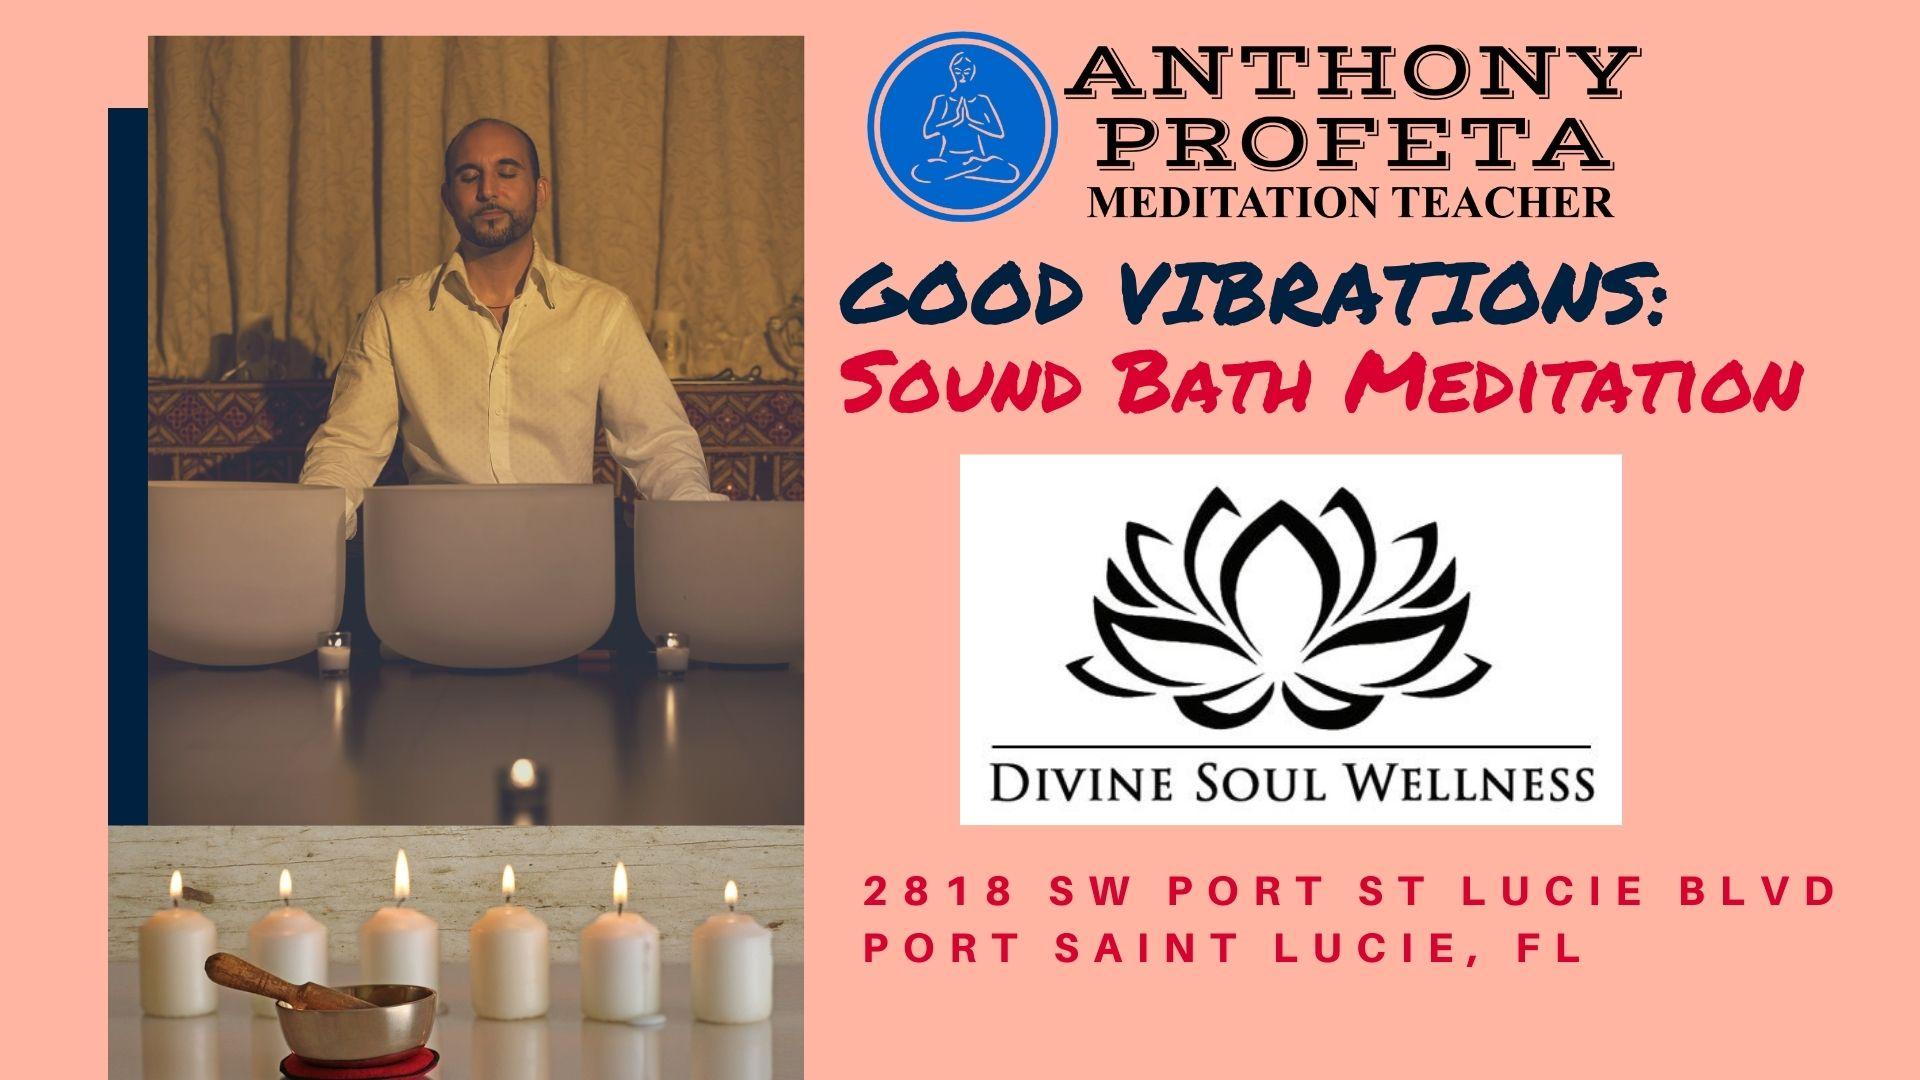 Good Vibrations SoundBath_Anthony Profeta